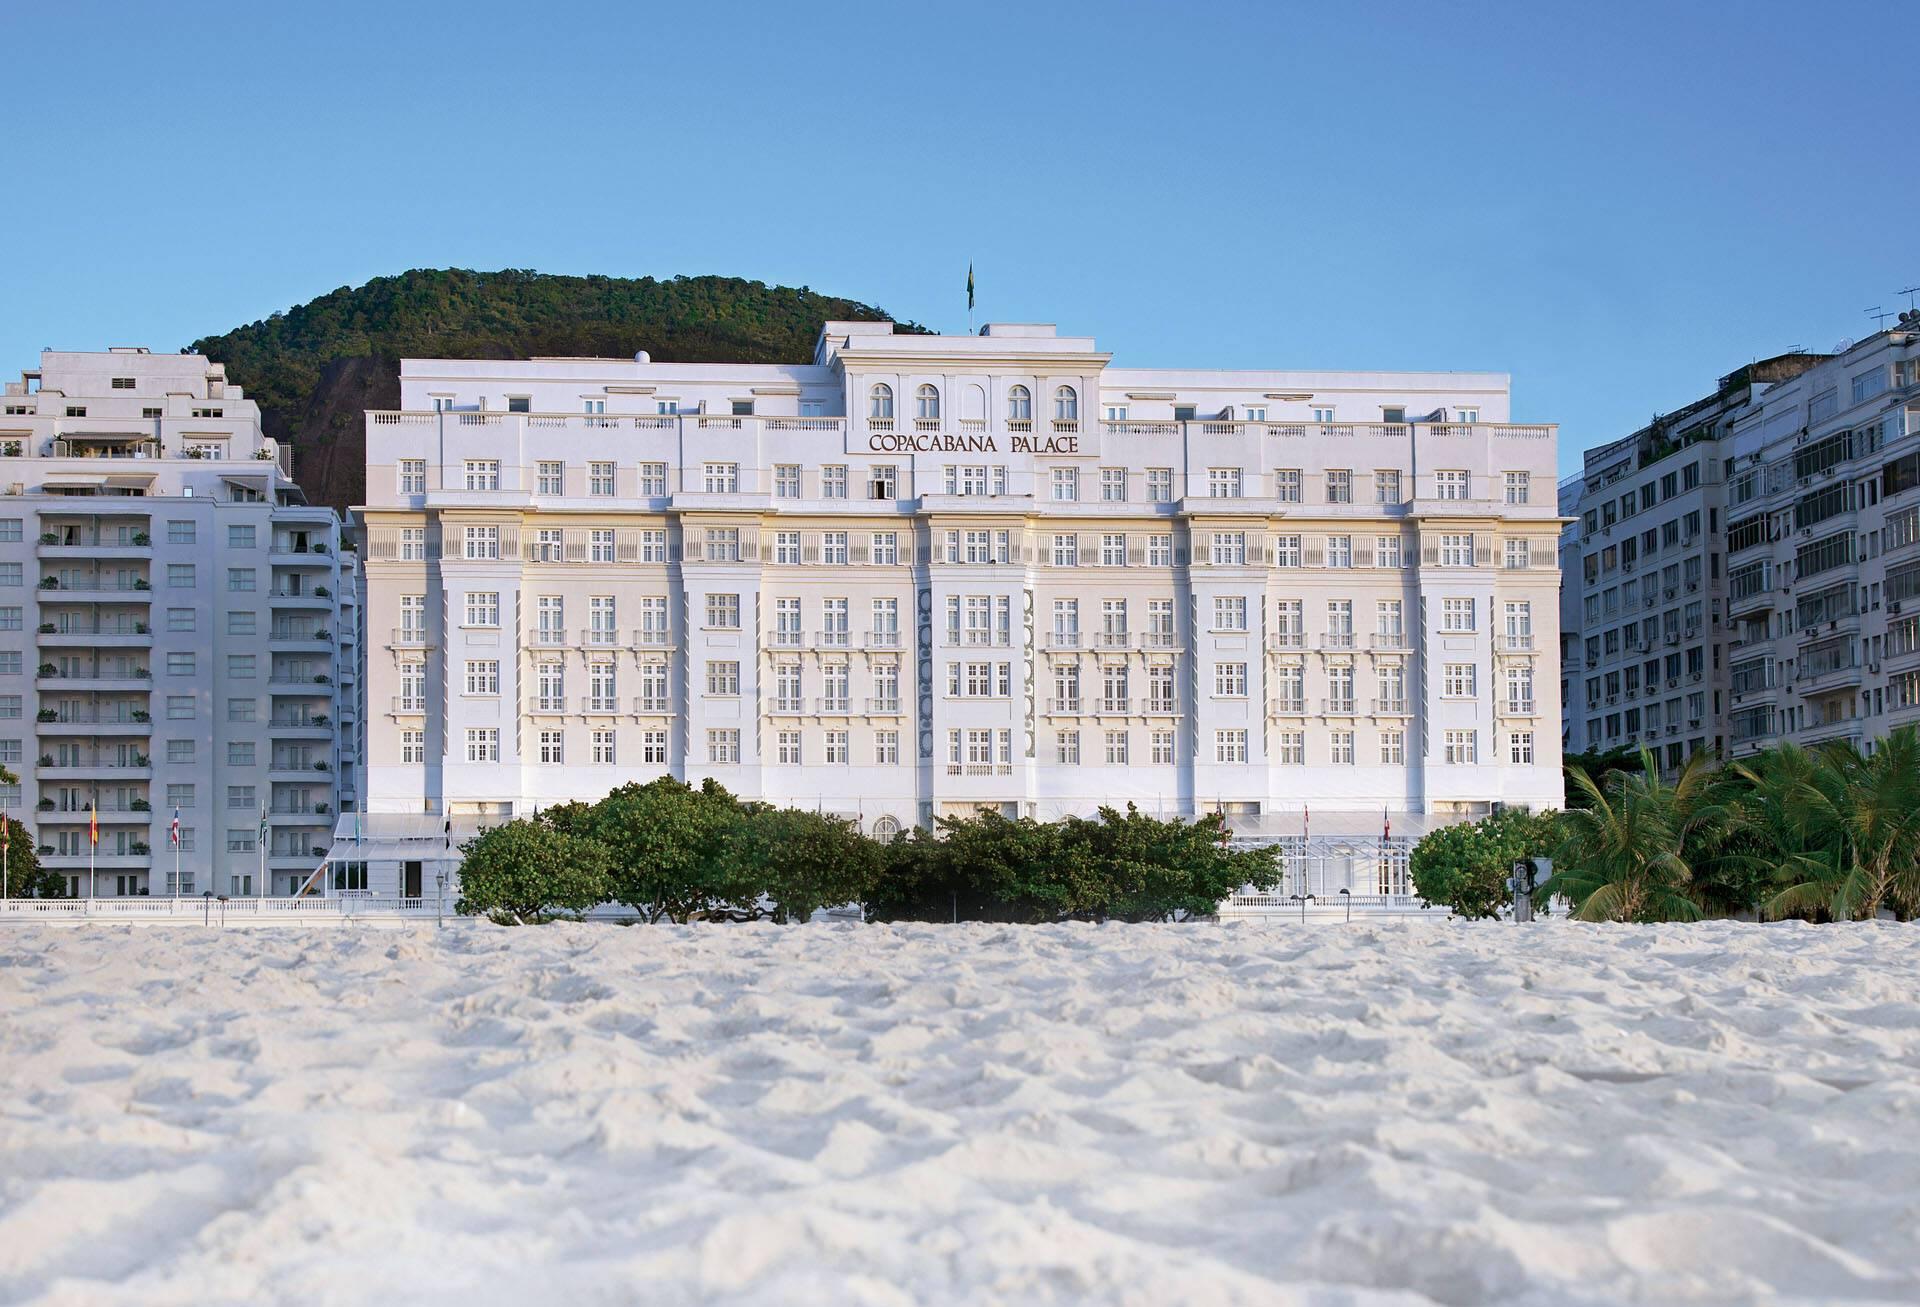 Bresil Belmond Copacabana Palace Hotel